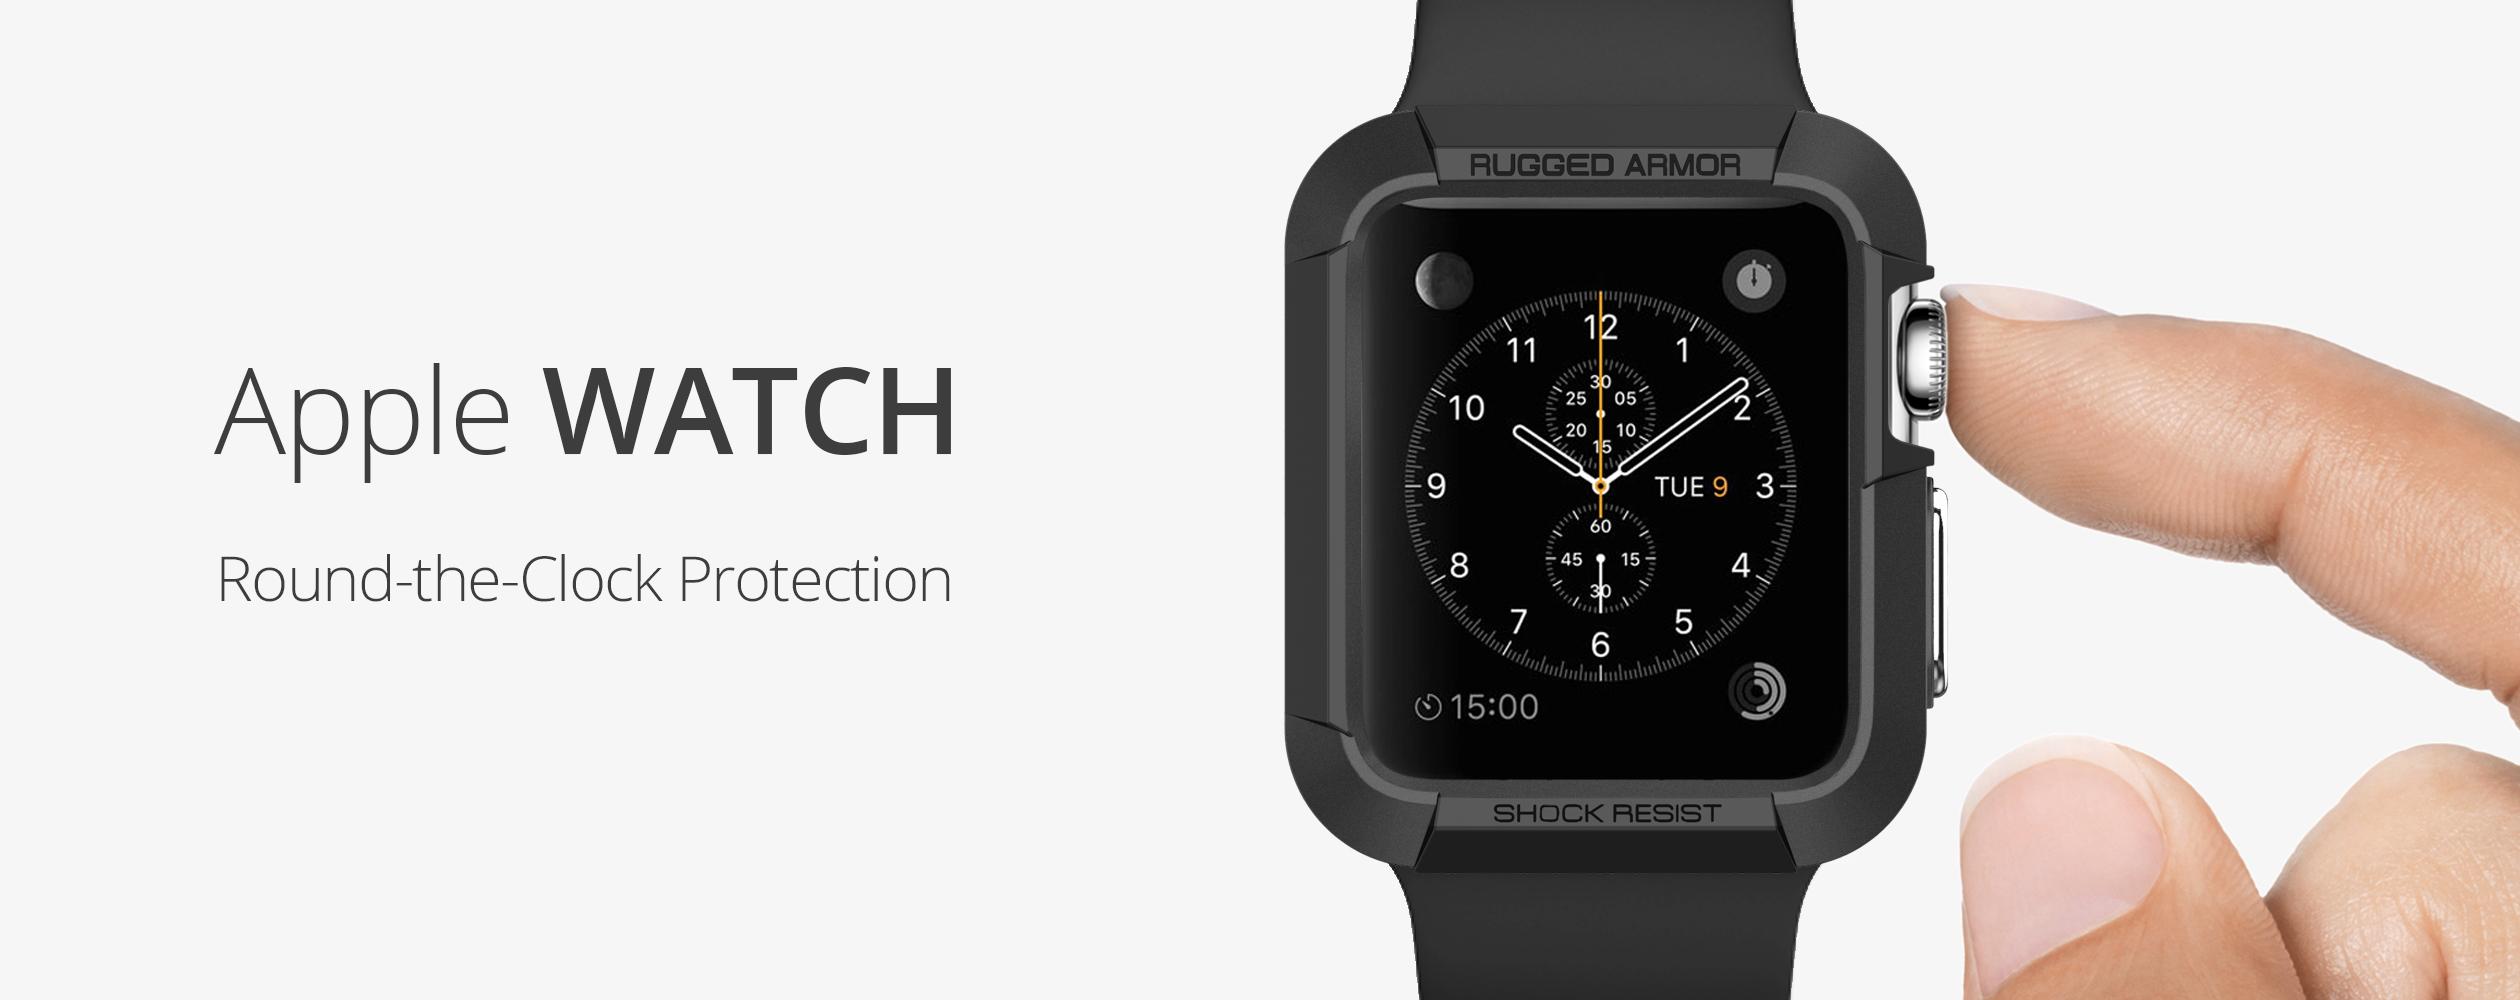 rug rugged casio is pro wear os trek smartwatch lowyat cheaper wsd a net and